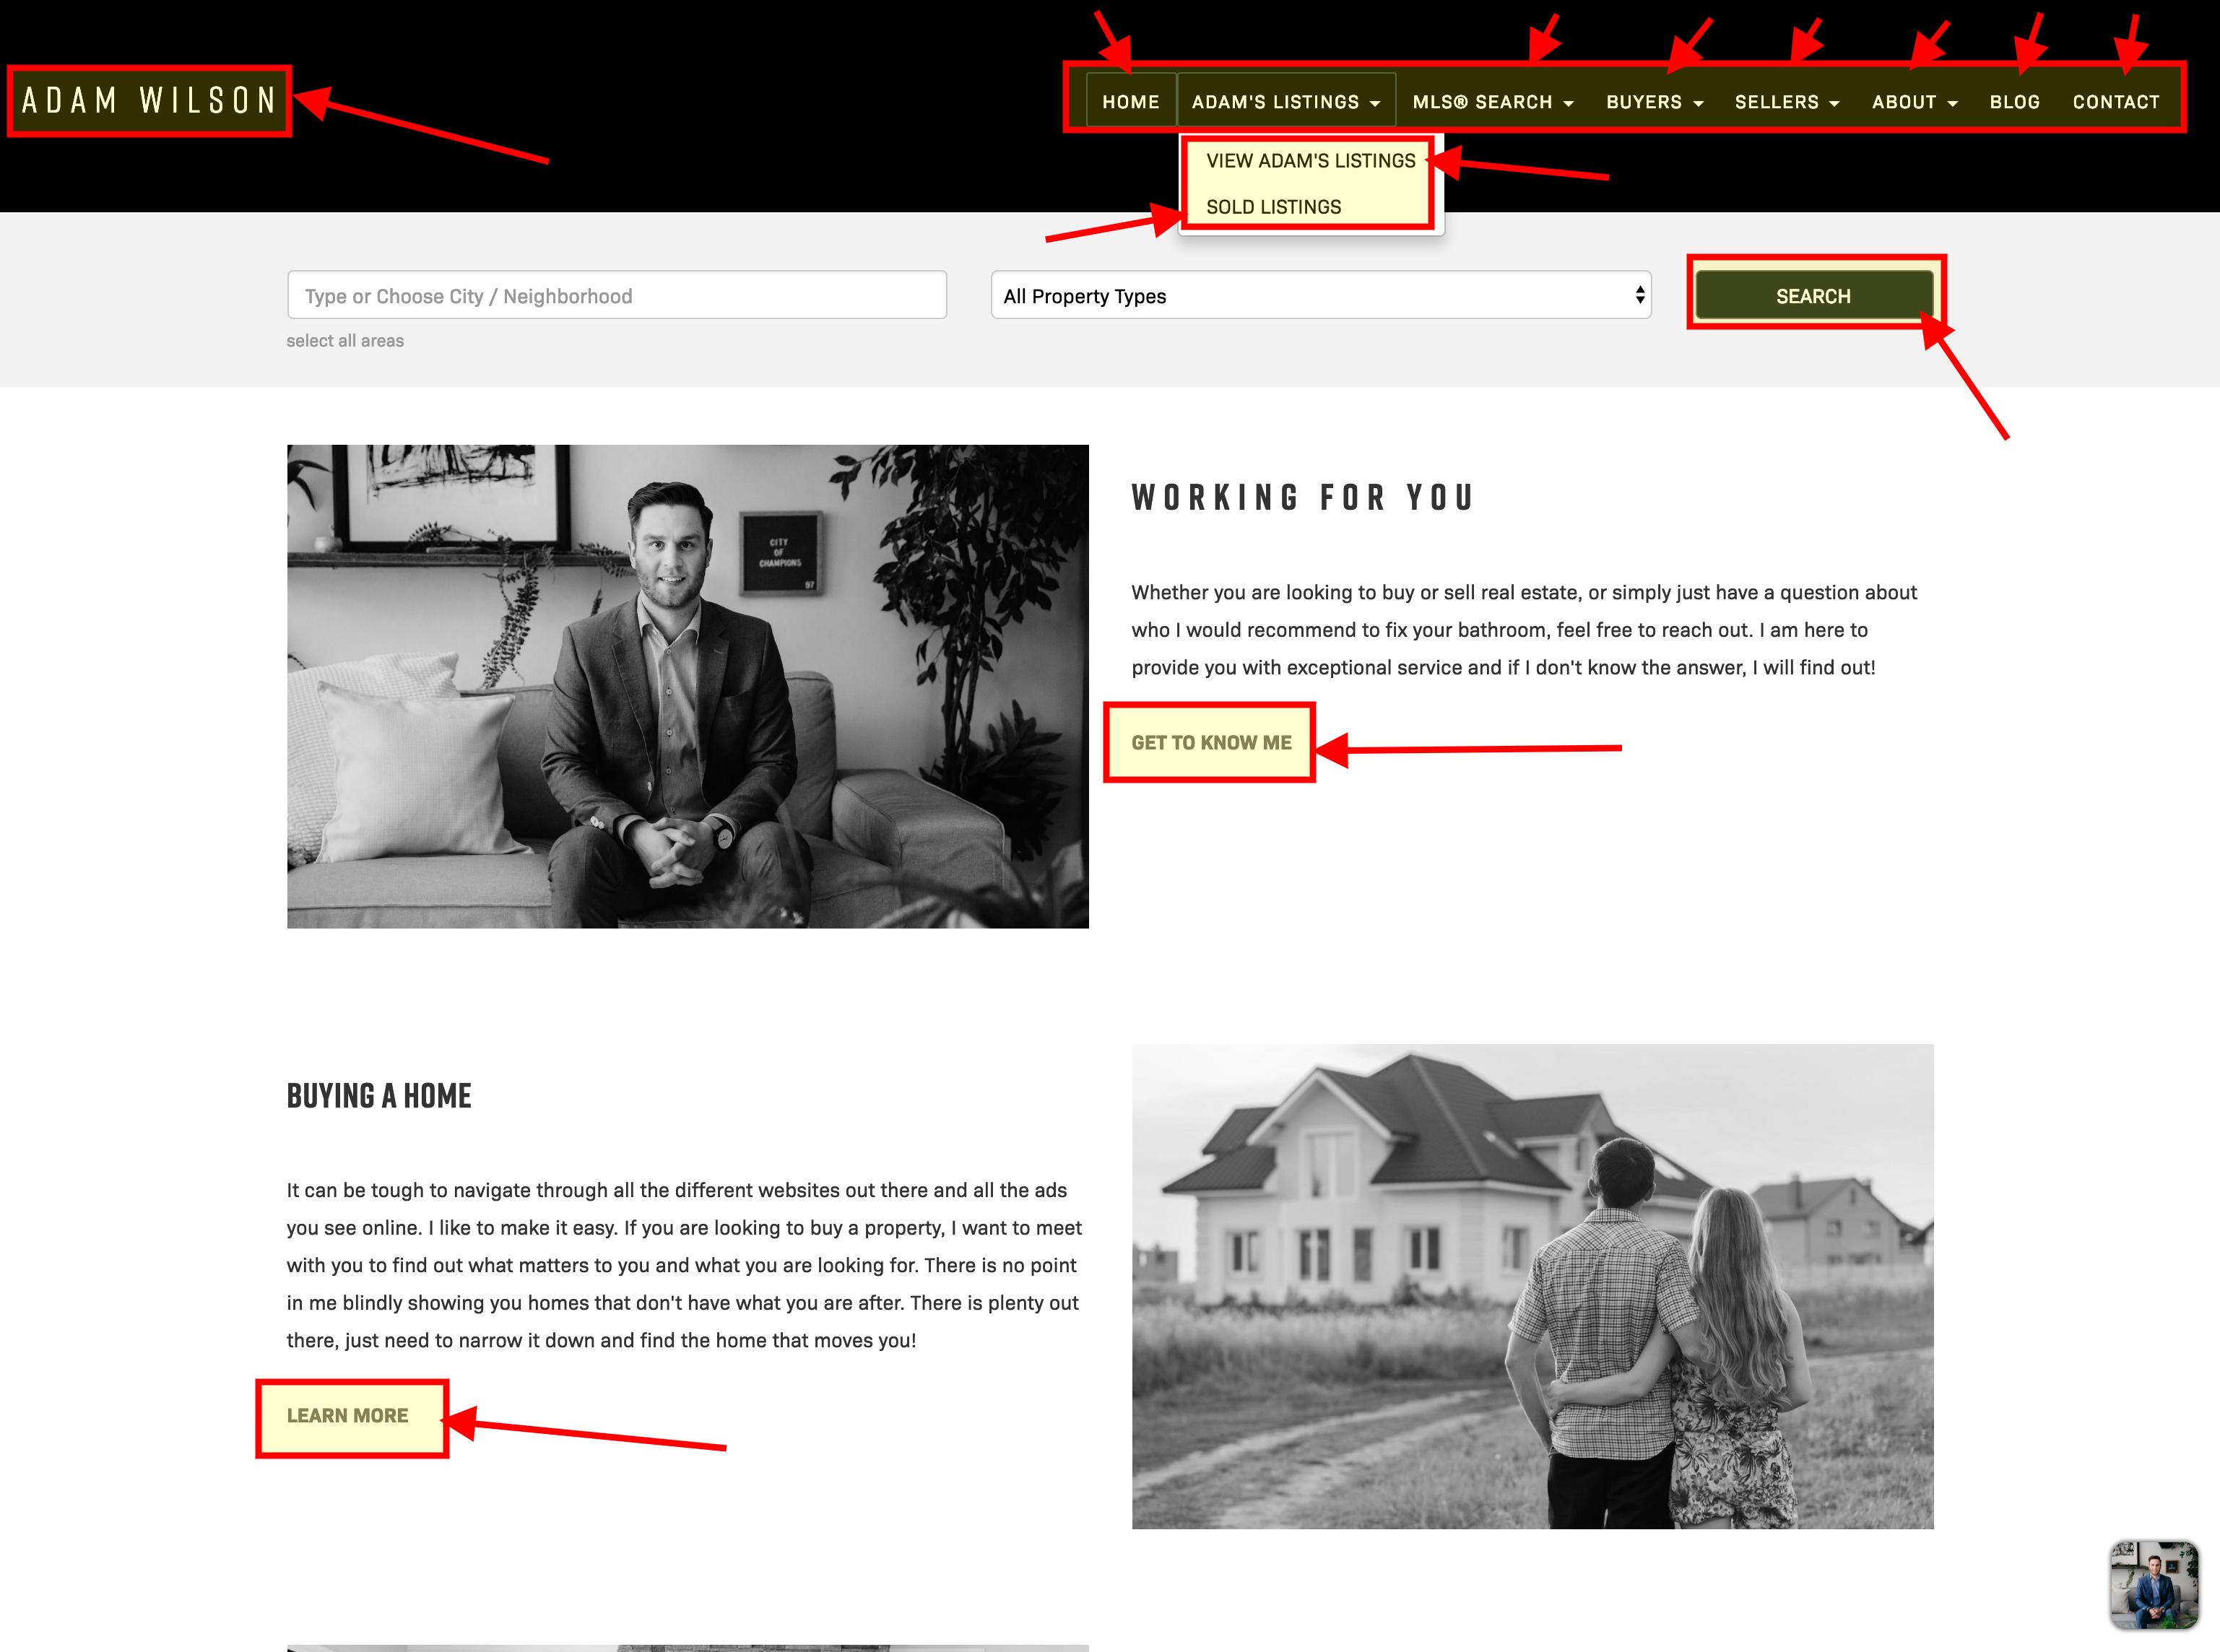 Interlinks on Adam Wilson's RealtyNinja real estate website